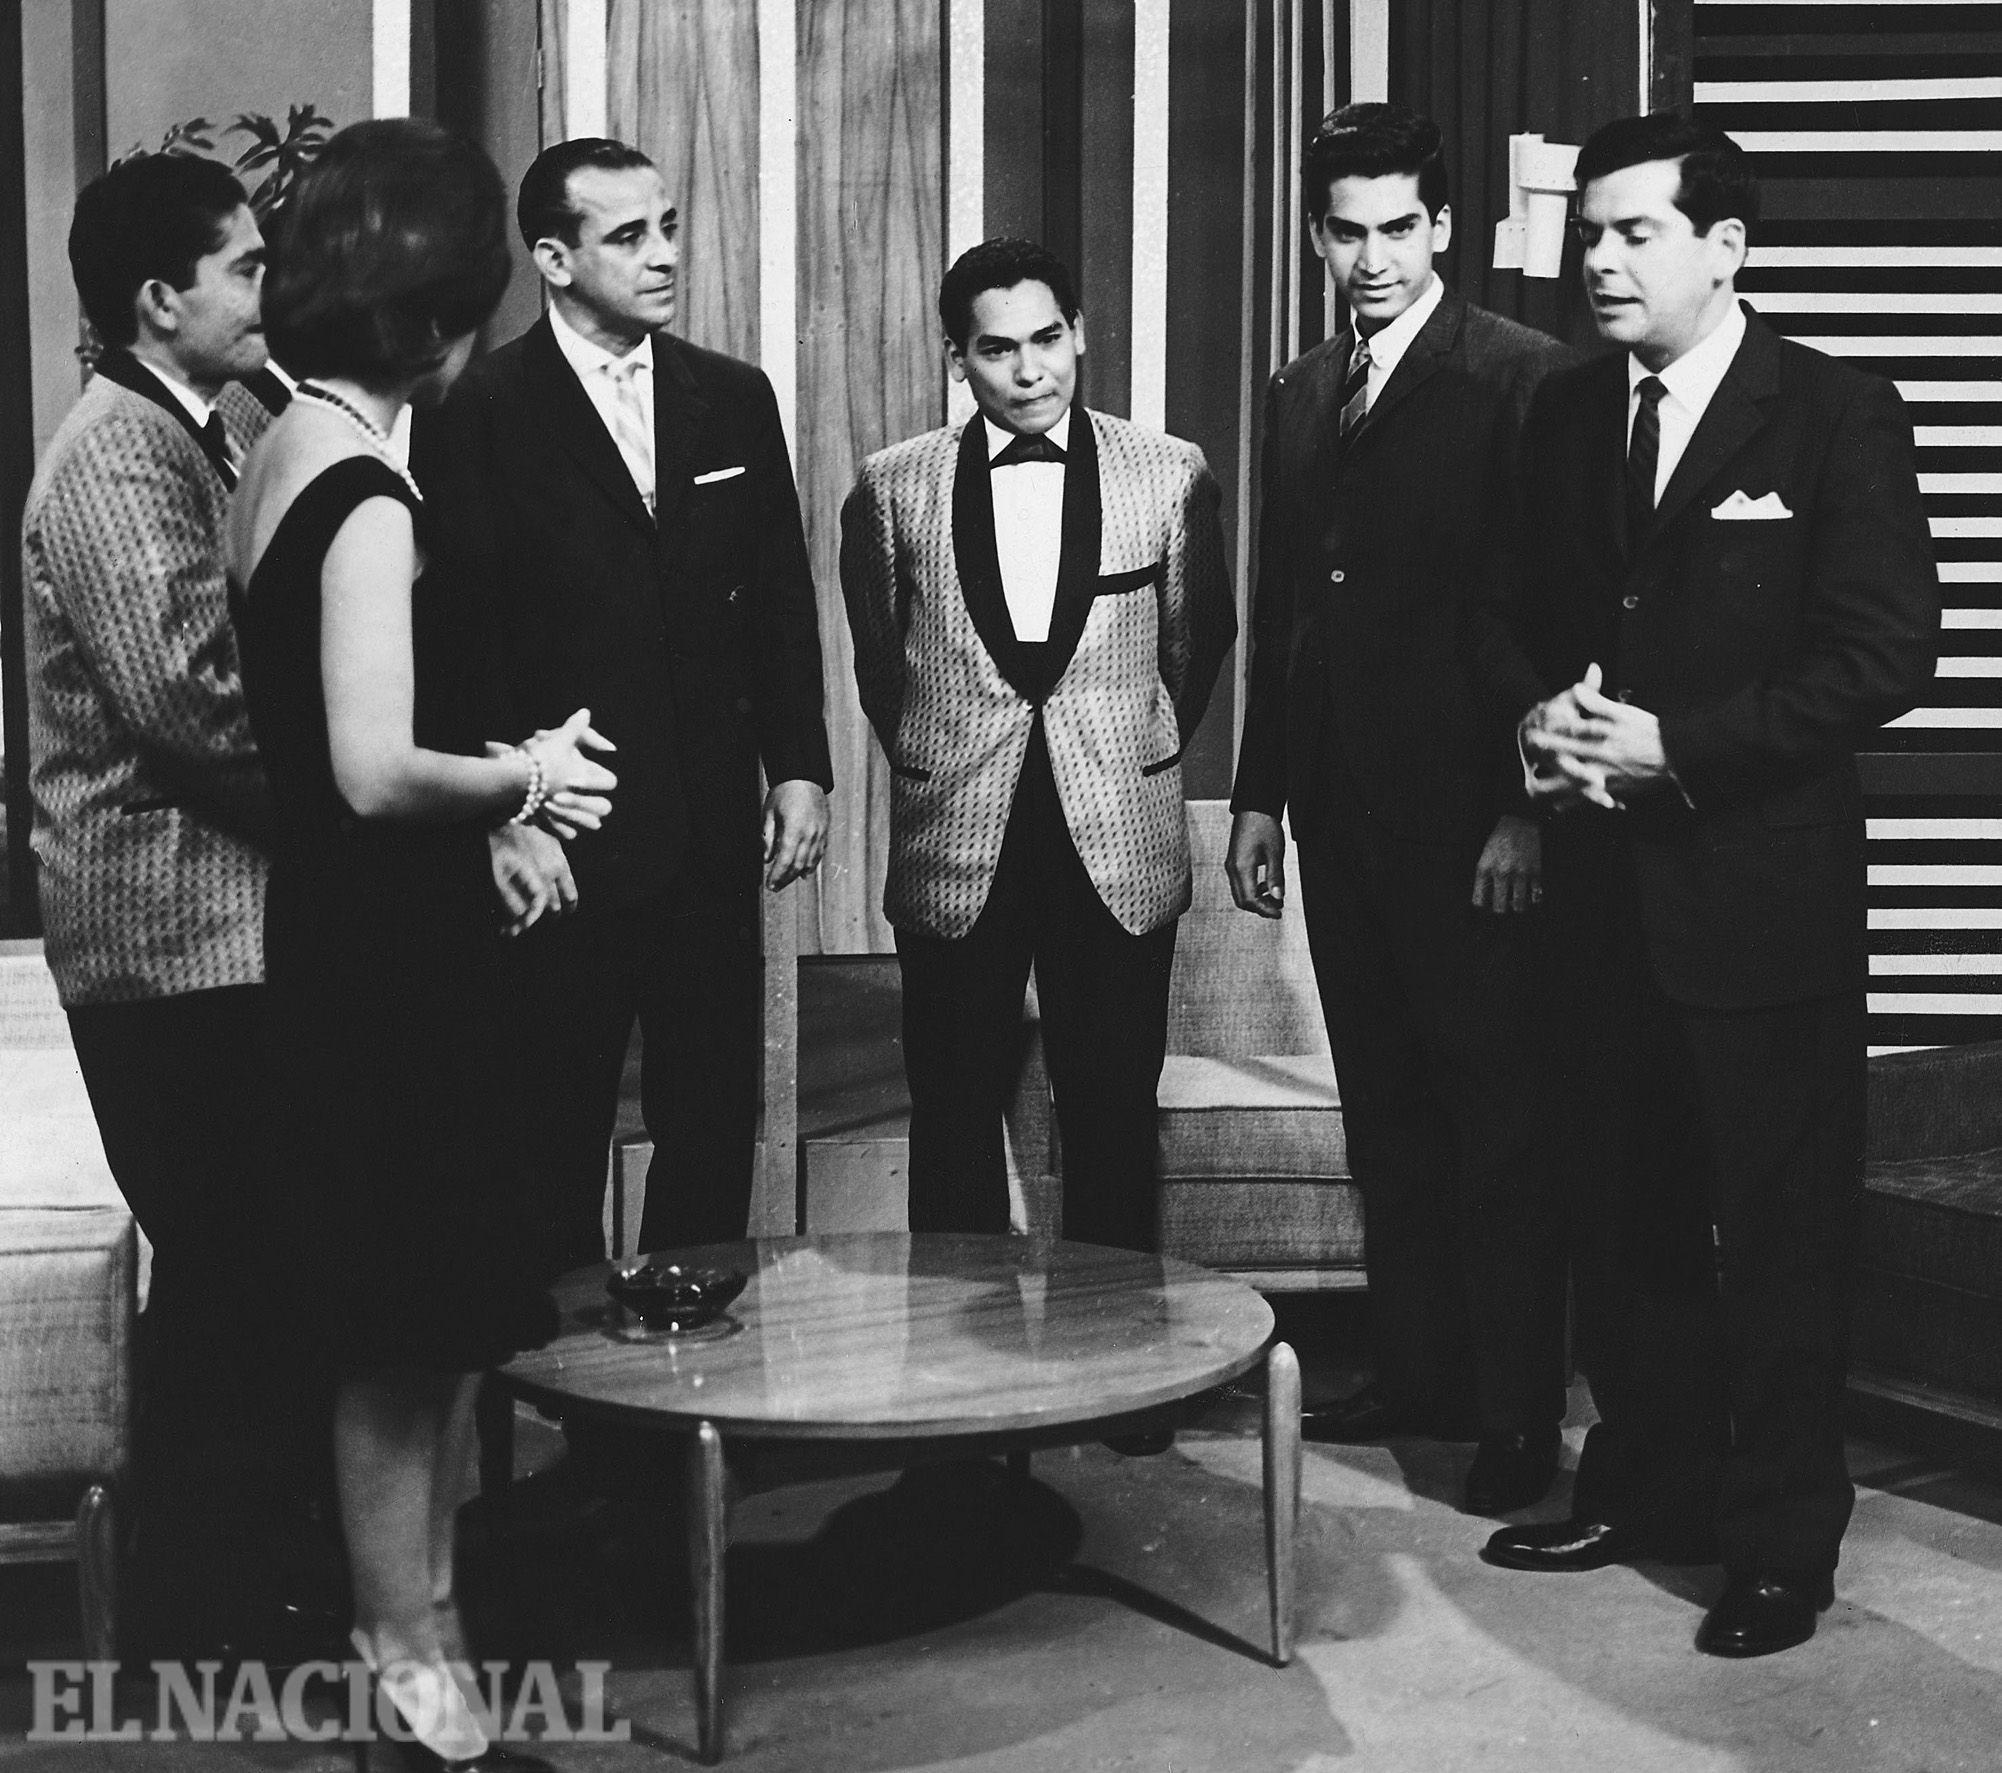 "Resultado de imagen de Billo Frometa cantan Víctor Piñero, Alberto Beltrán, Pío Leiva, Carlos Díaz, etc."""